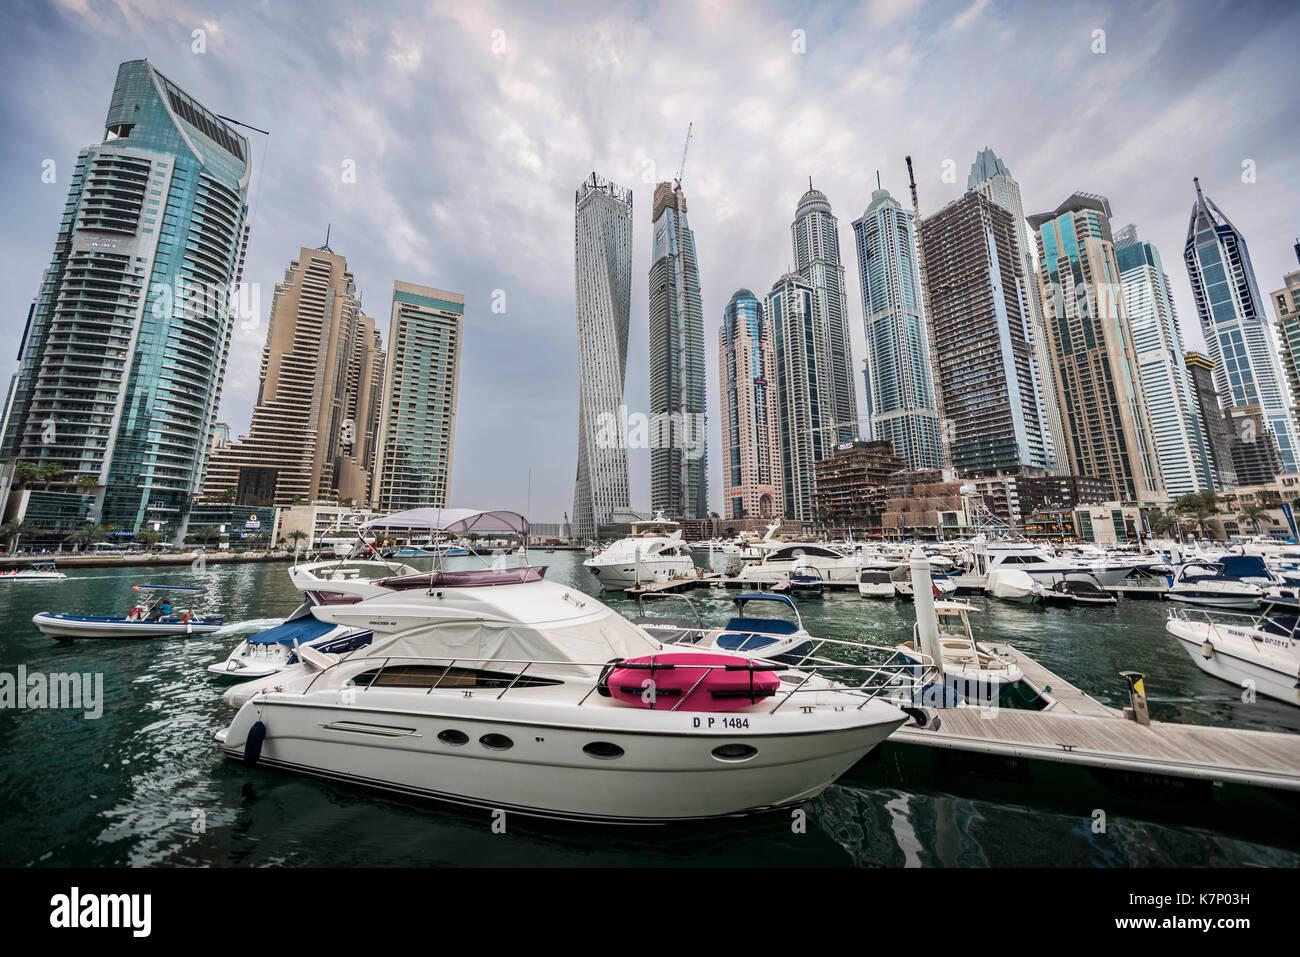 Marina in front of skyscrapers, Dubai Marina, Dubai, United Arab Emirates Stock Photo